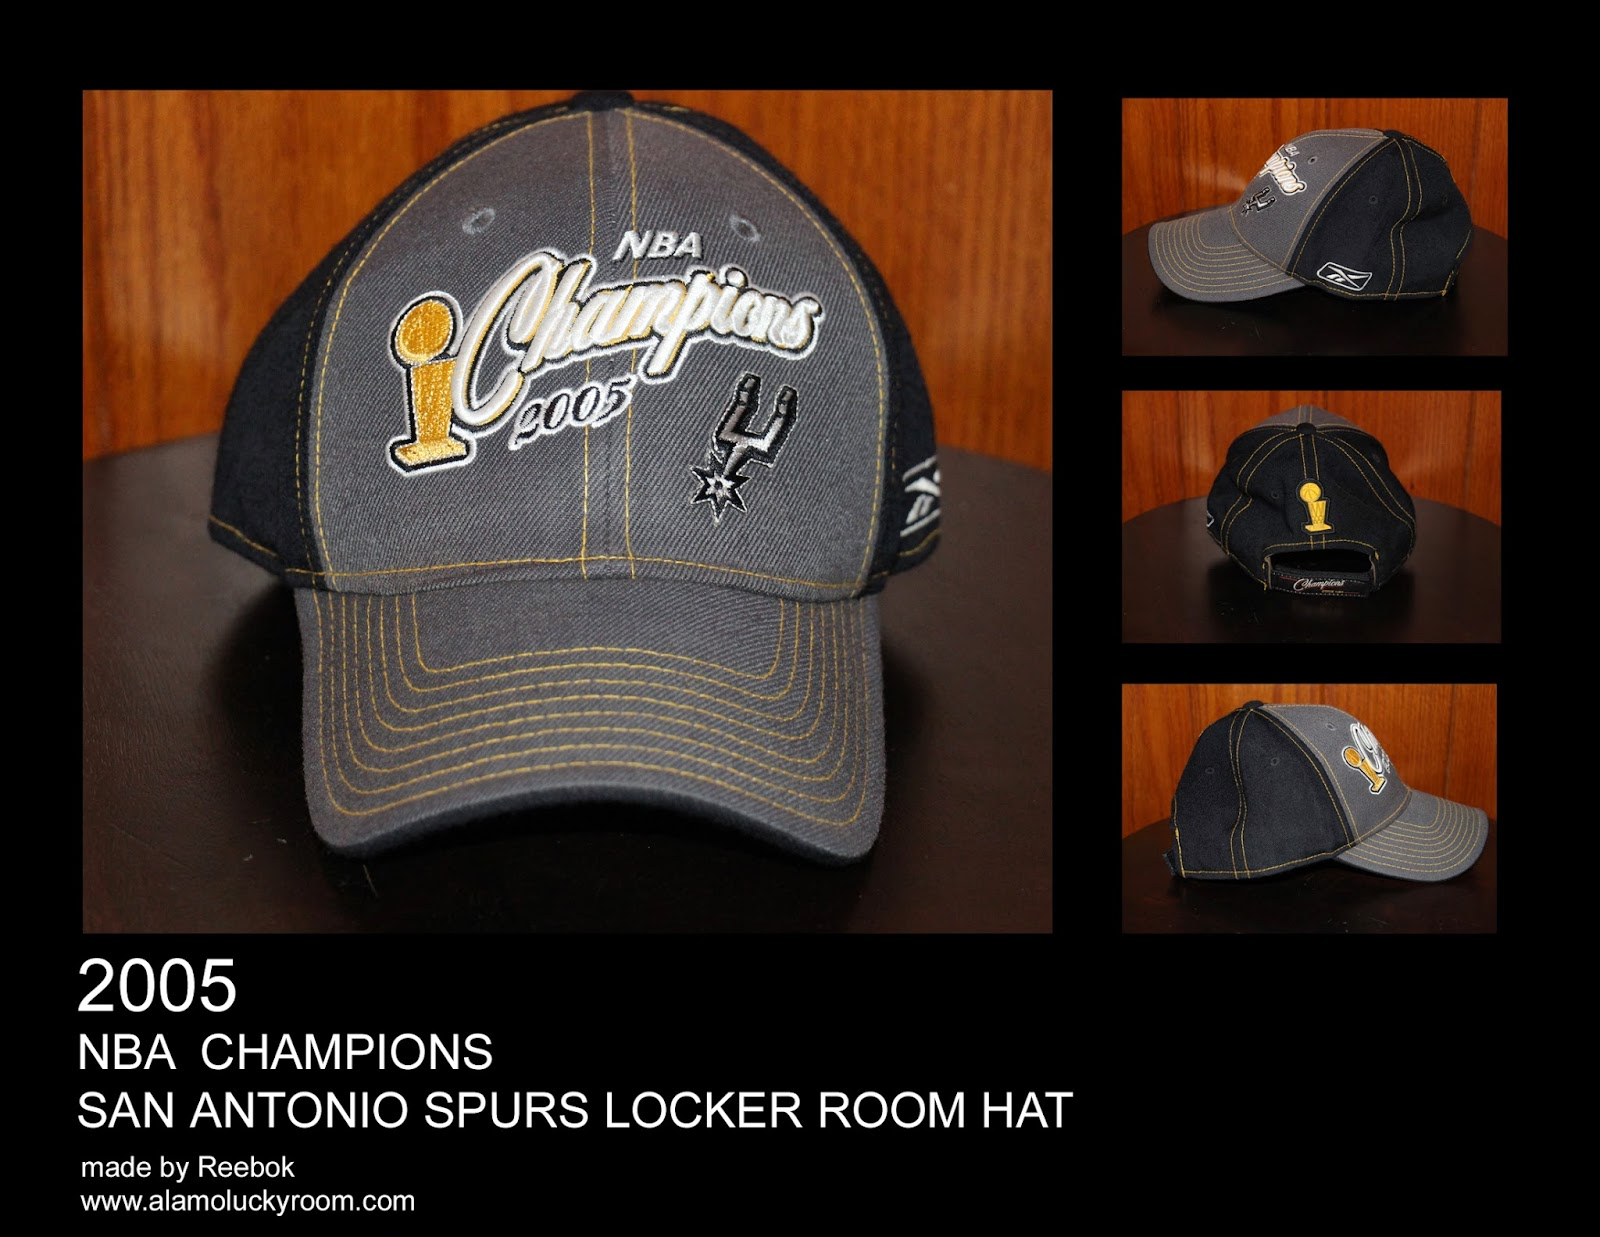 a9fb10aca99 Alamo Lucky Room  2005 San Antonio Spurs NBA Champions Locker Room Hat